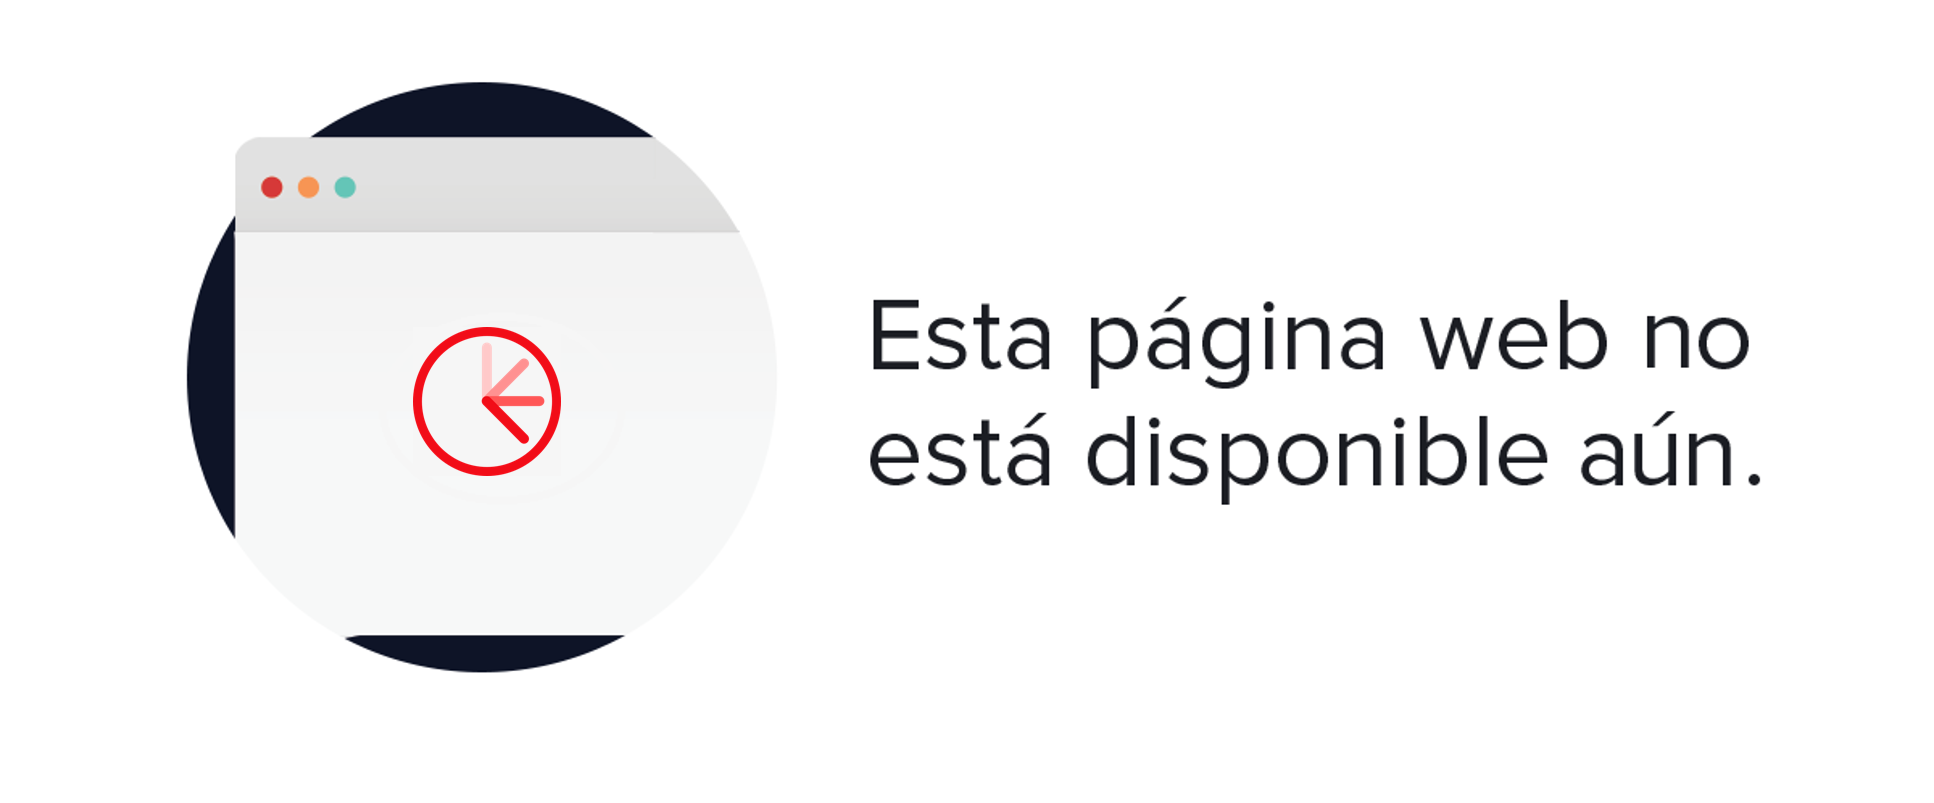 OXXO - Pantalón de mujer OXXO pitillo con 5 bolsillos Naranja 8681613077683 - PXKUNRU